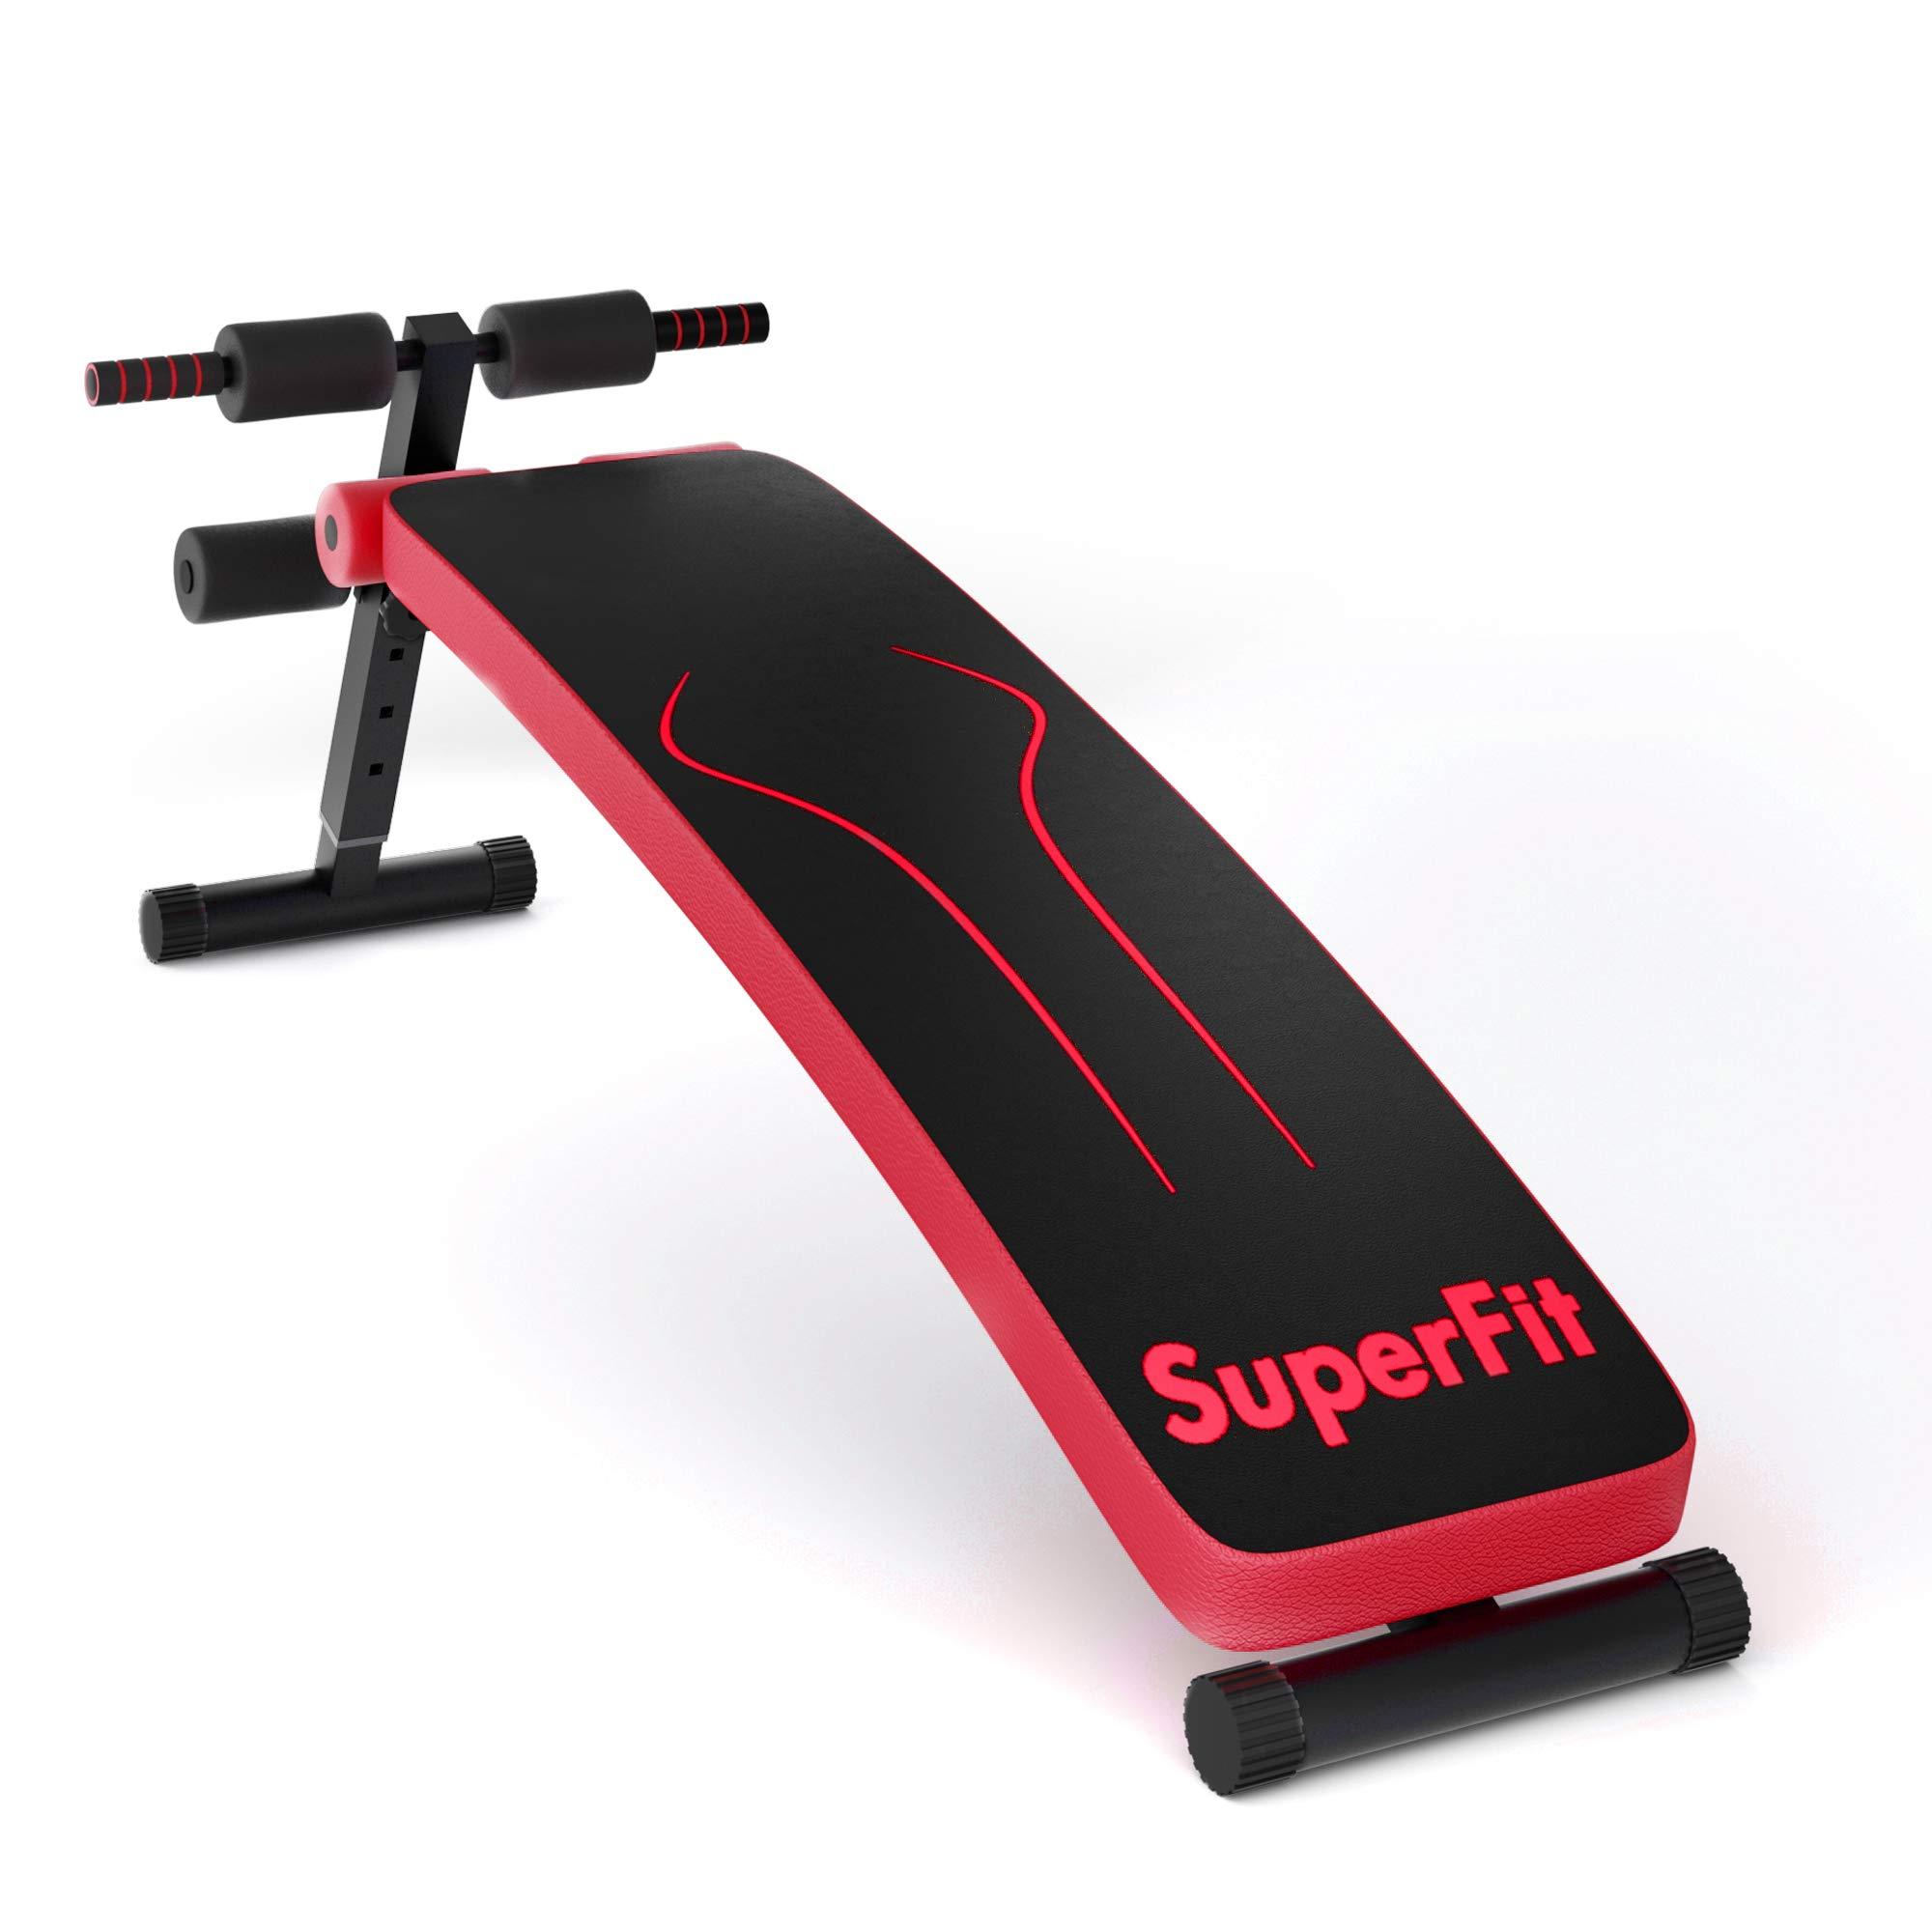 Goplus Adjustable Abdominal Training Exercises